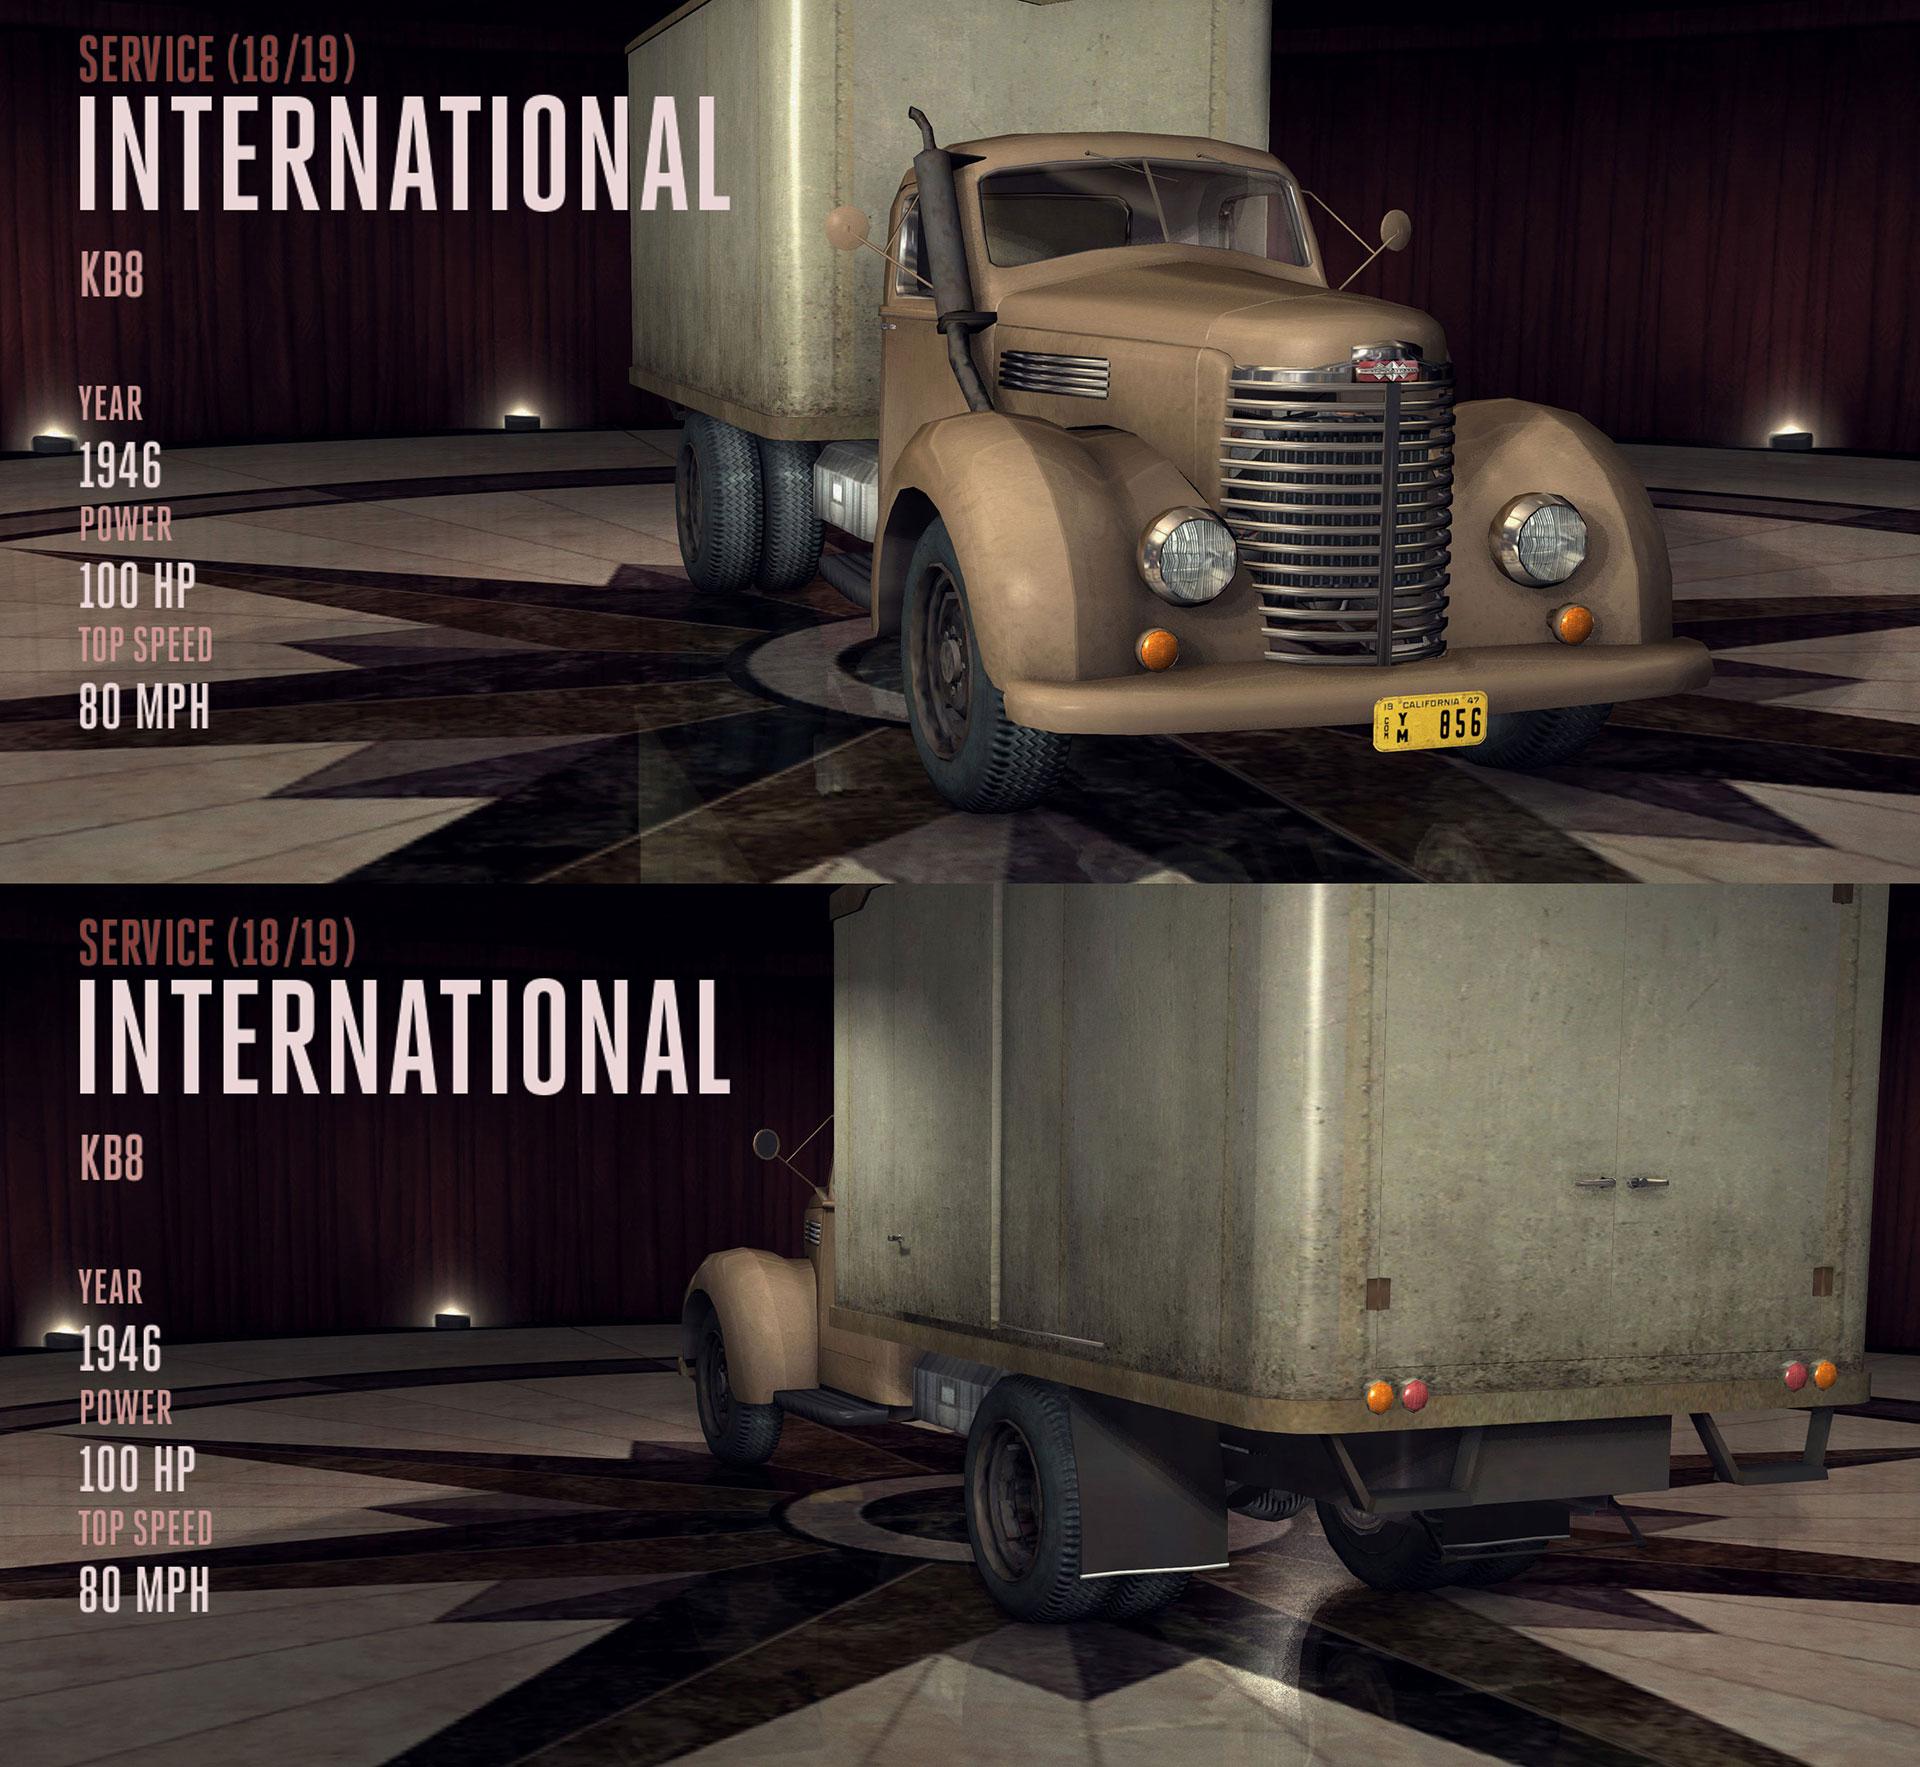 International KB8